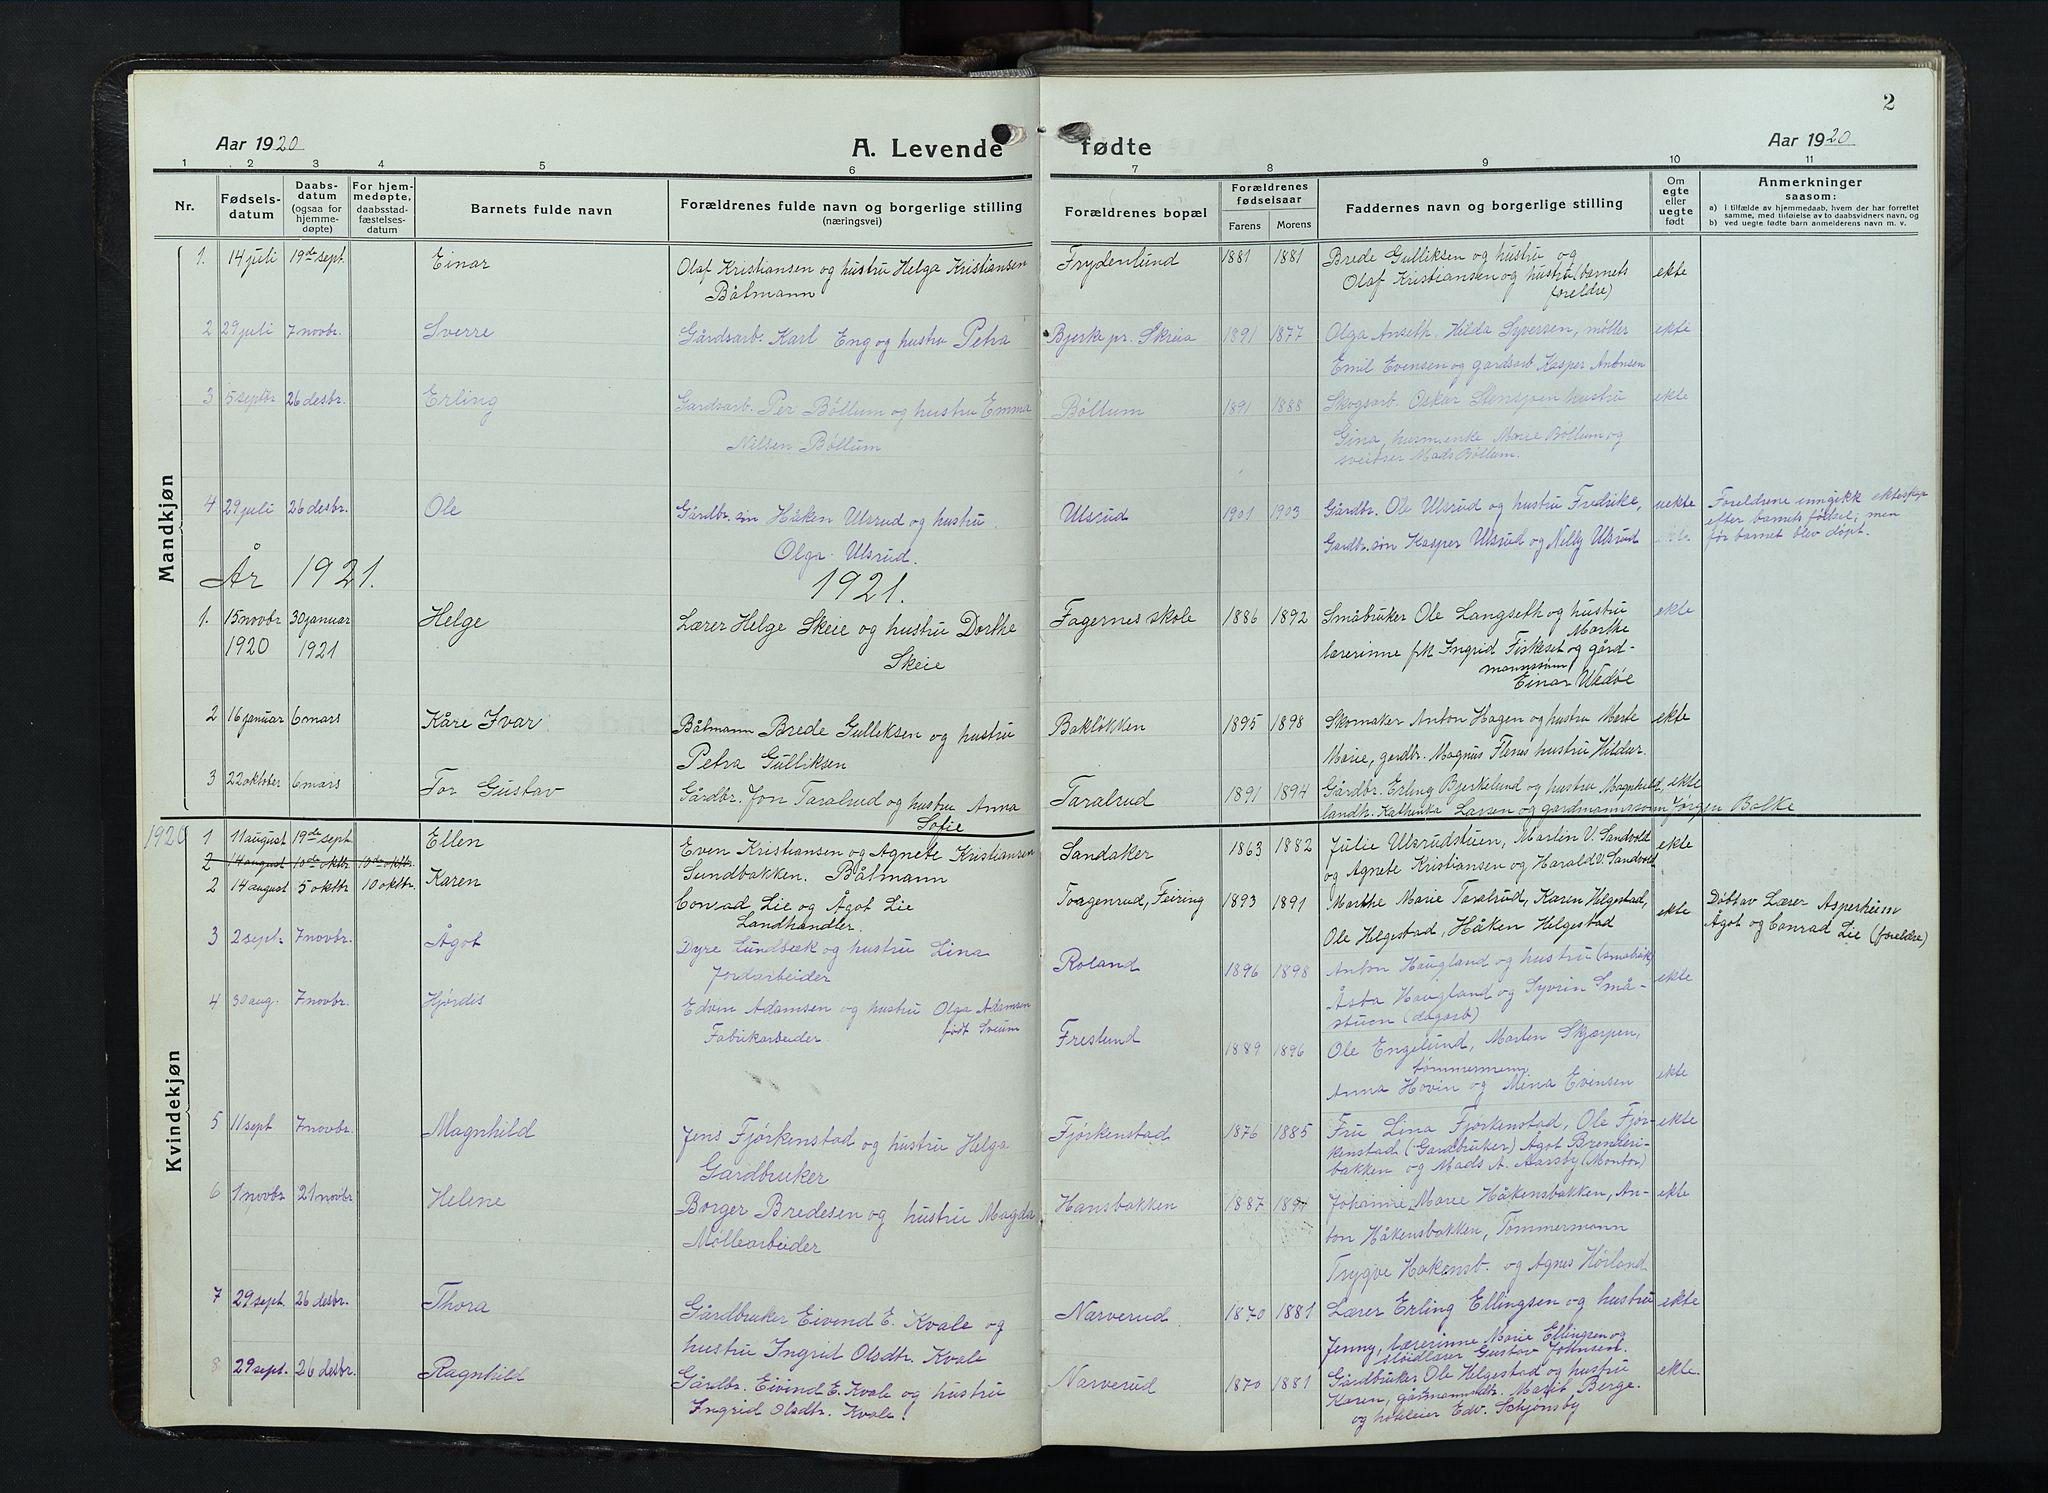 SAH, Balke prestekontor, Klokkerbok nr. 1, 1920-1955, s. 2